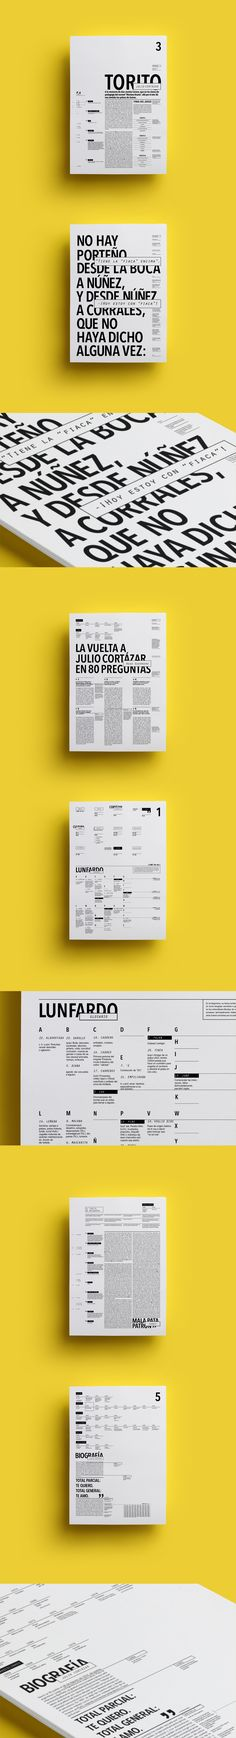 LUNFARDO   Editorial - Tipografía 2 Longinotti